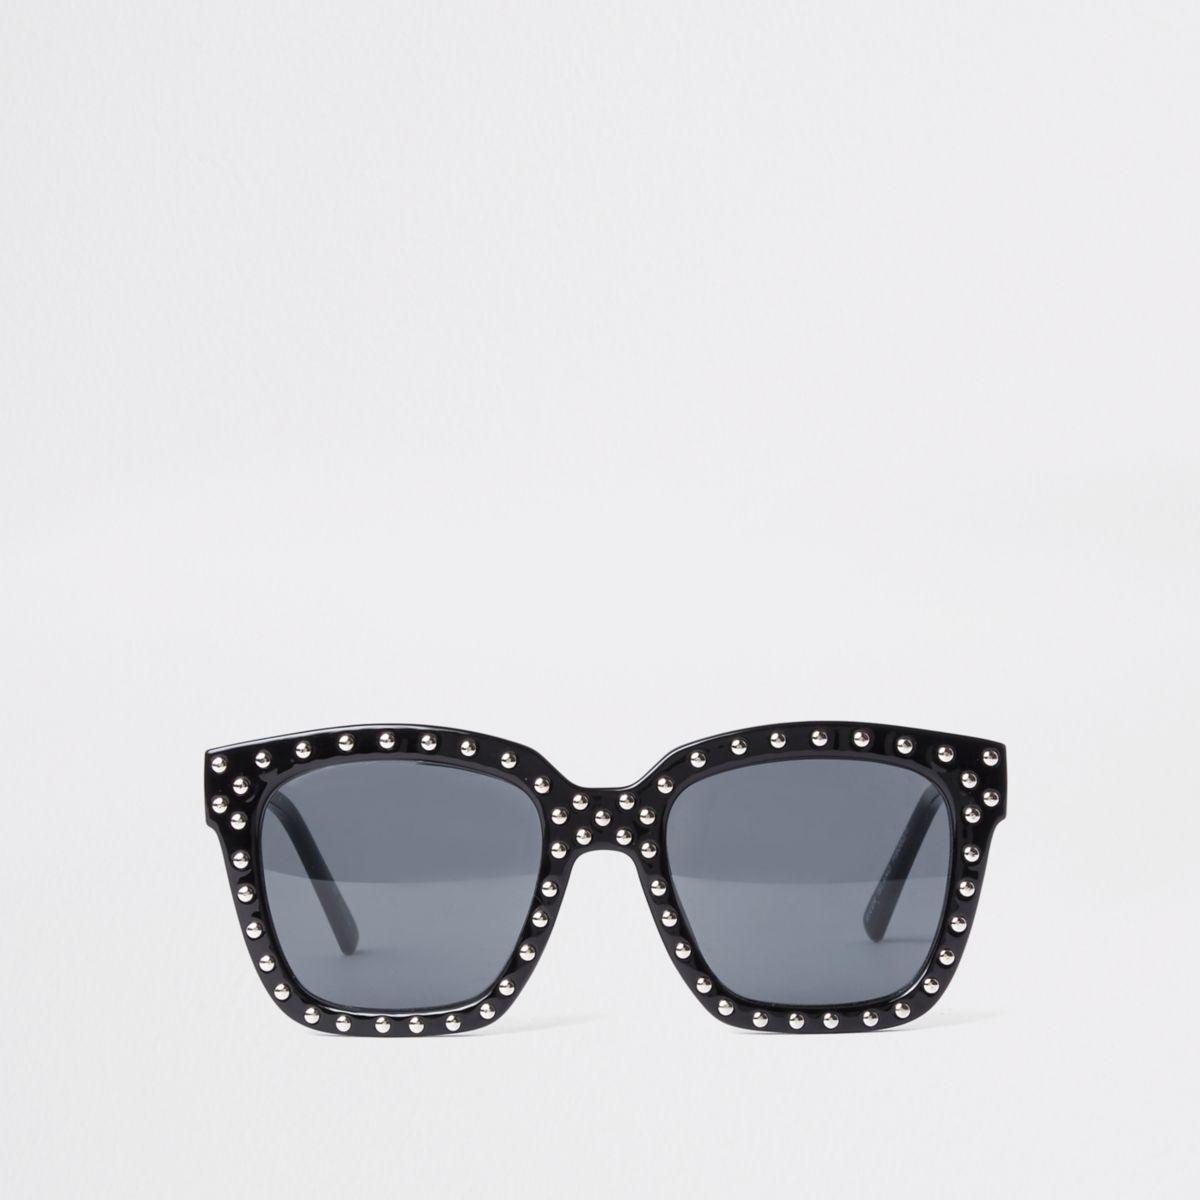 Schwarze Oversized Sonnenbrille